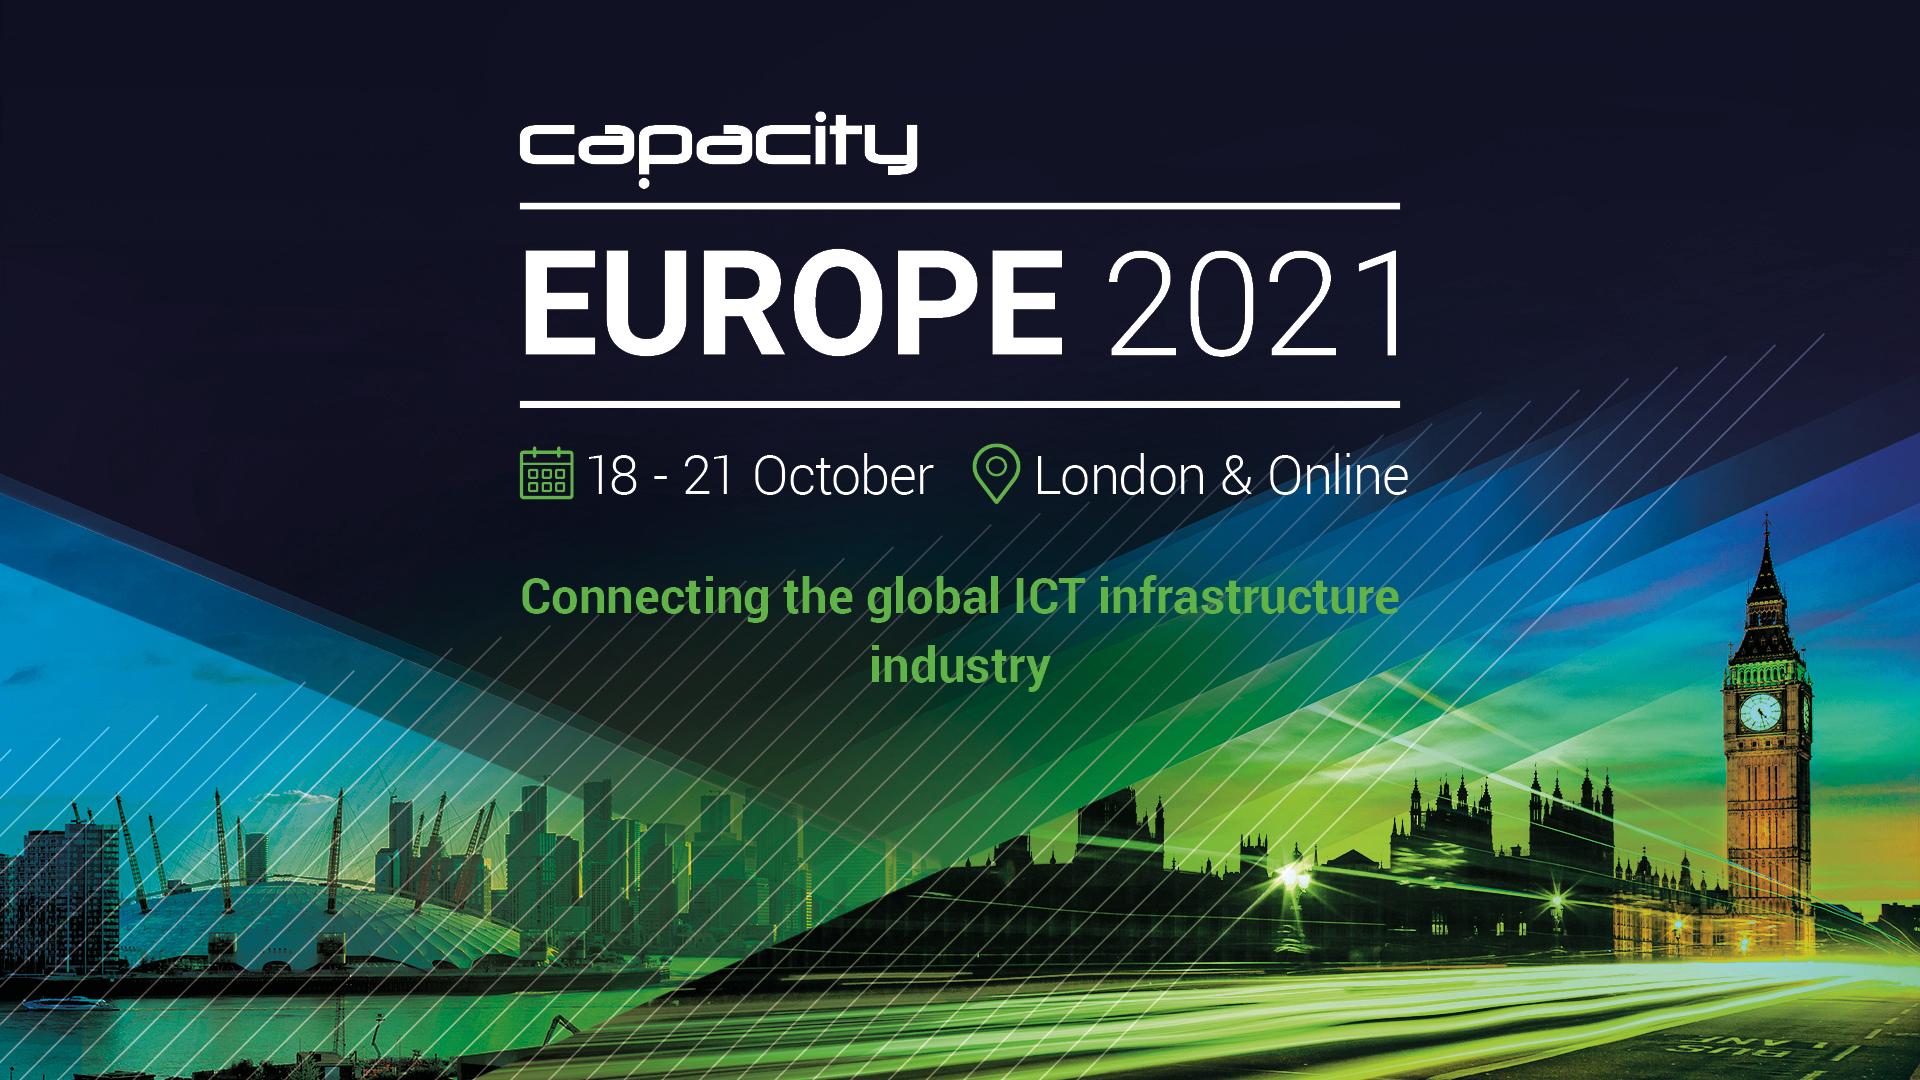 Capacity Europe 2021_Standard Slide_1920x1080_Version 2